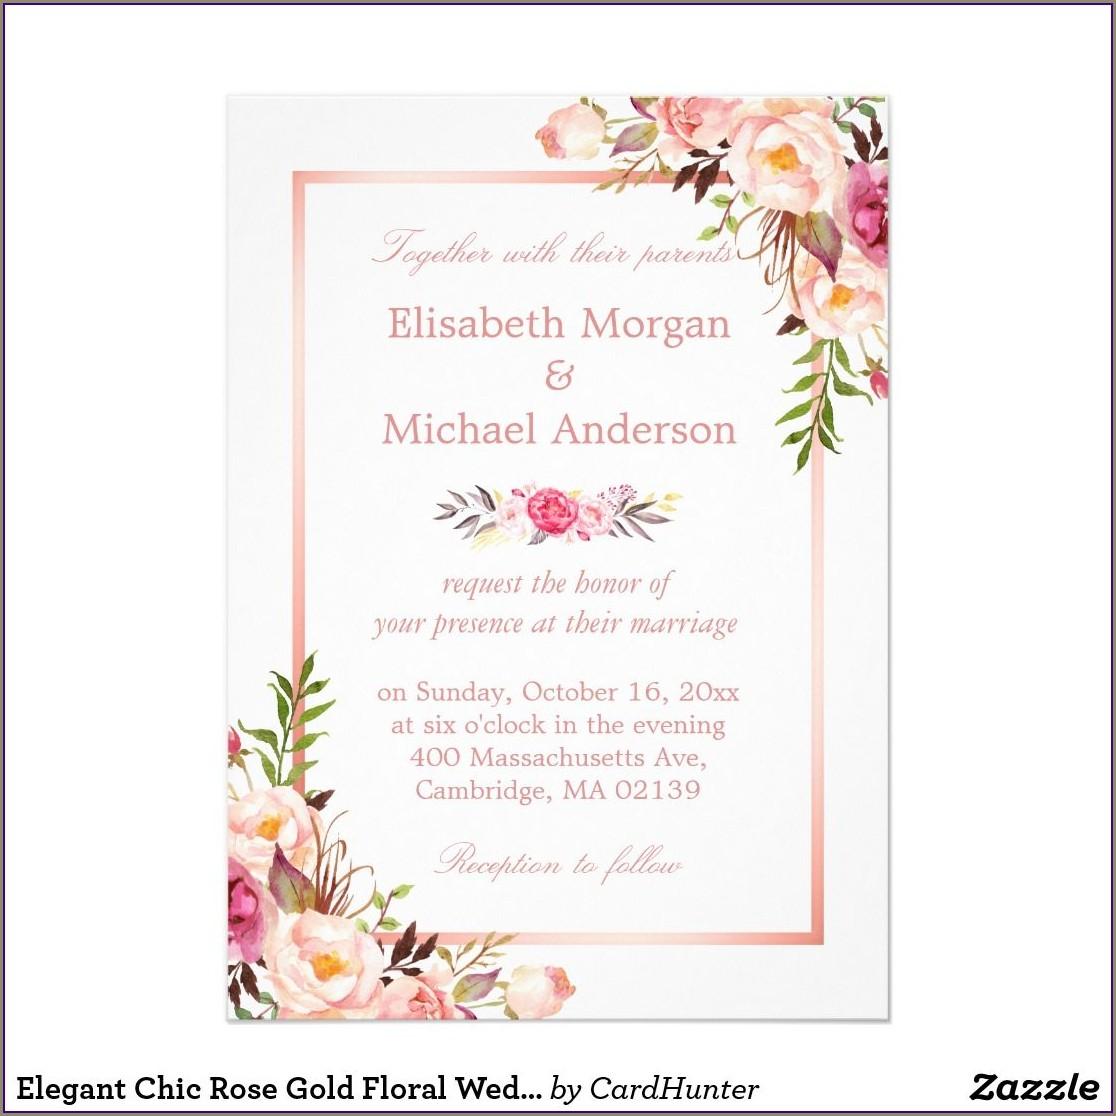 Rose Gold Floral Wedding Invitations